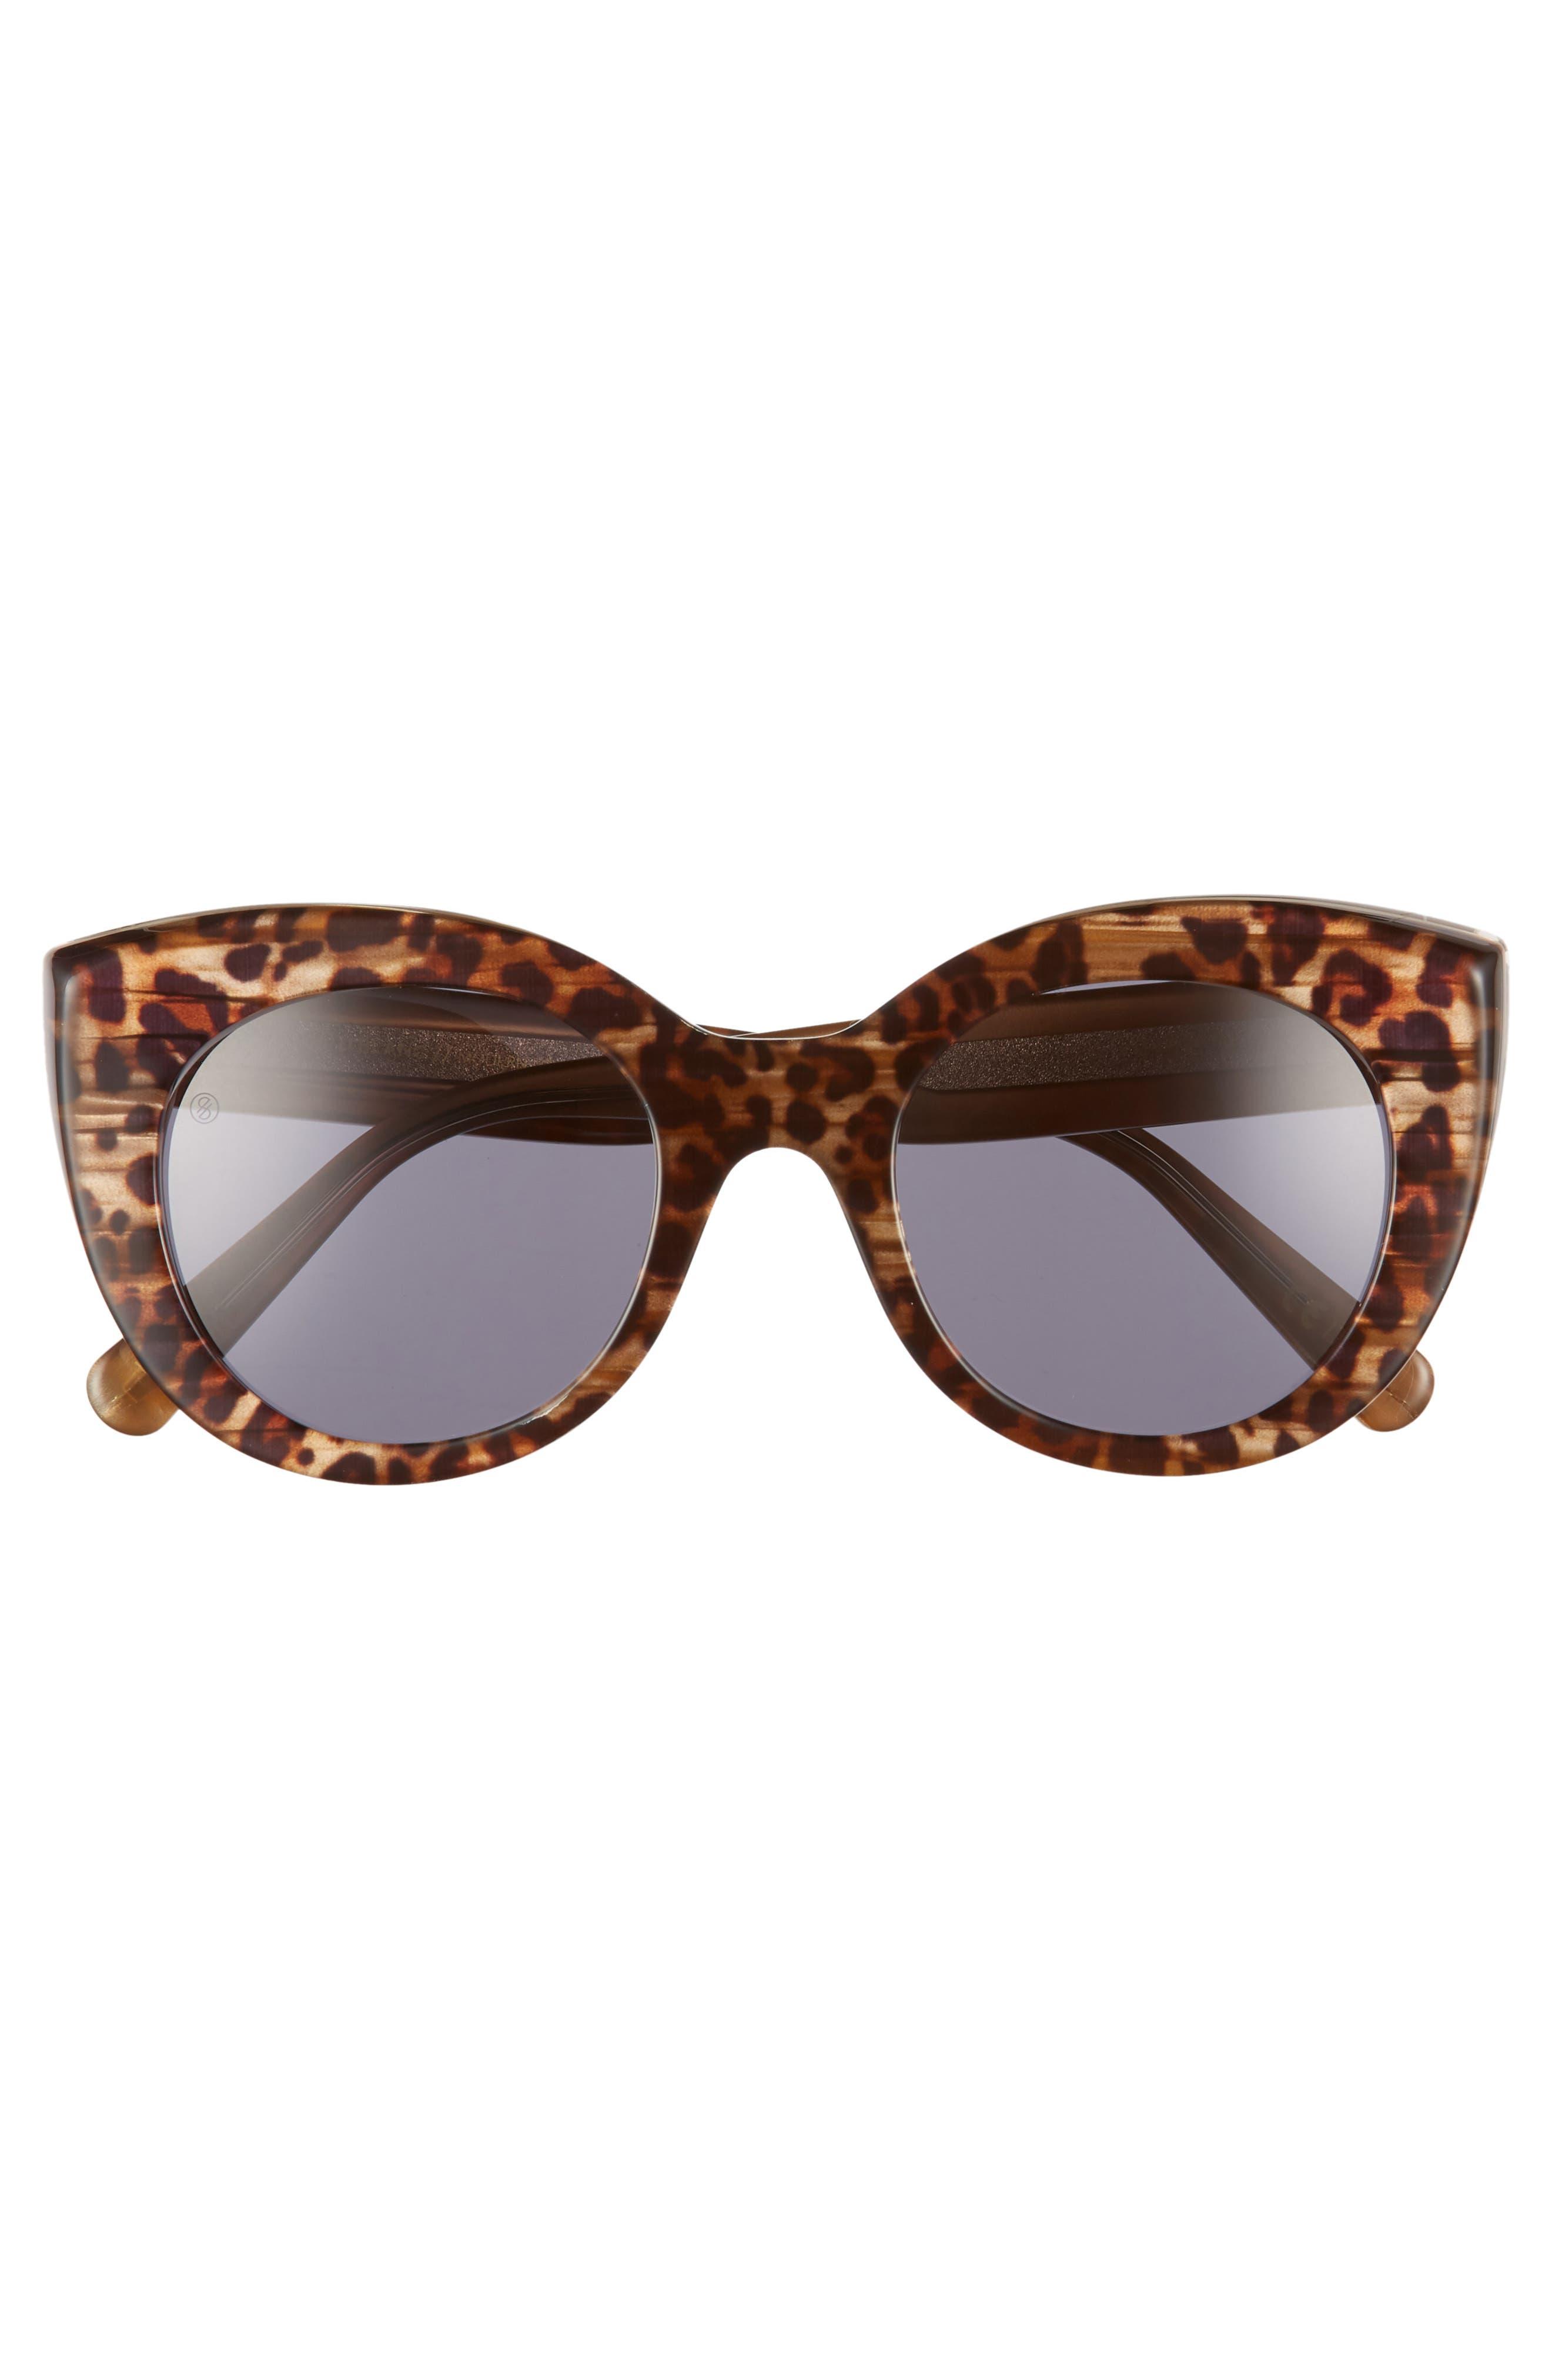 D'BLANC x Amuse Society Modern Lover 51mm Cat Eye Sunglasses,                             Alternate thumbnail 3, color,                             Cheetah/ Grey